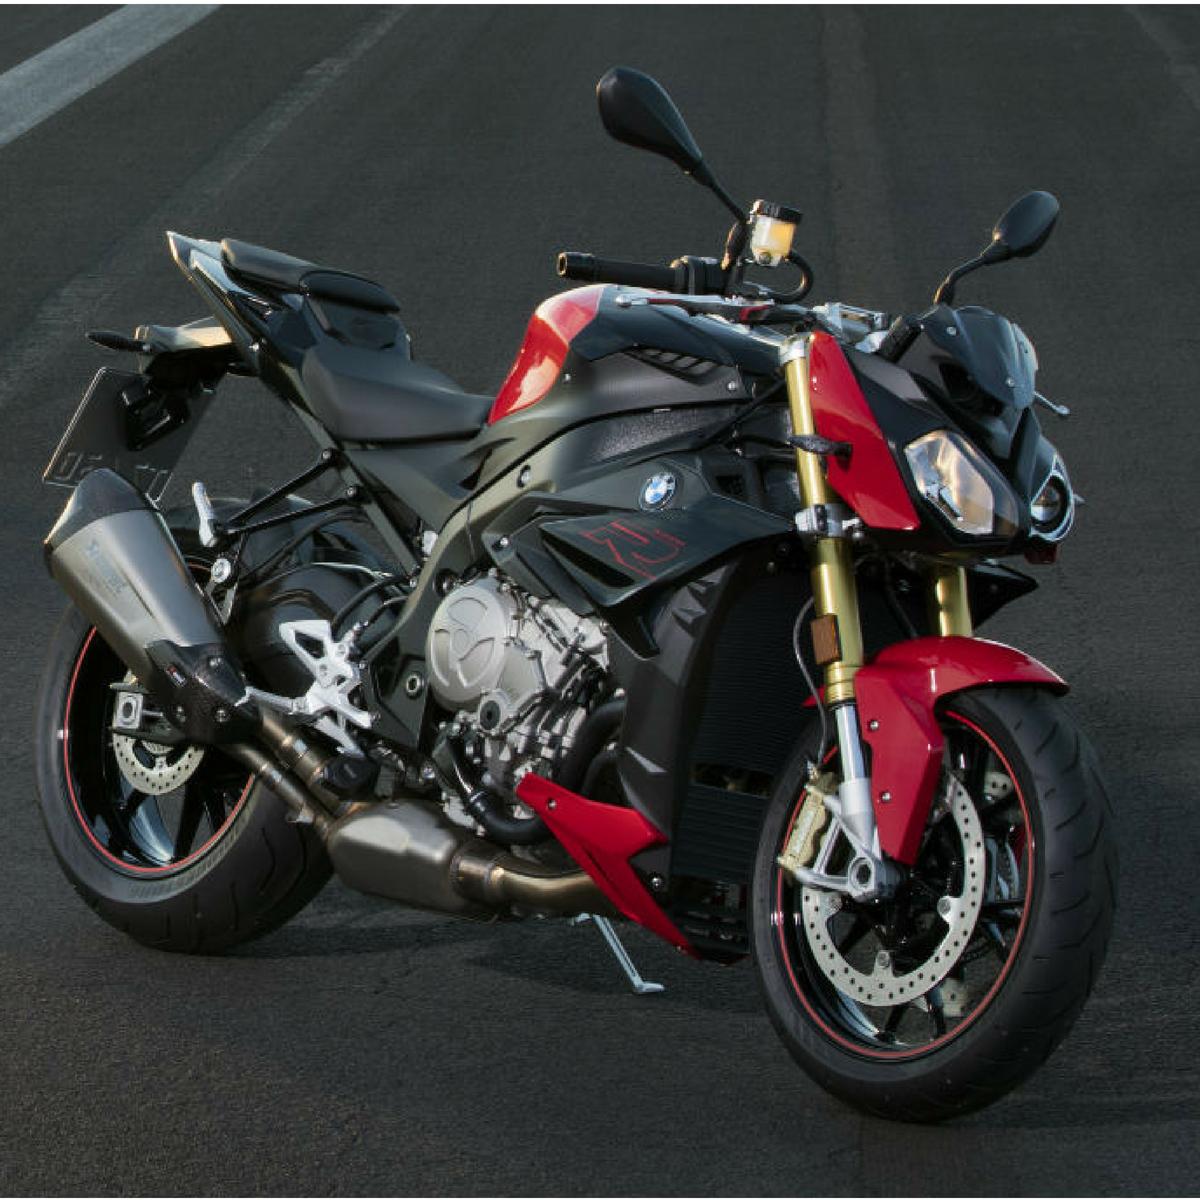 Bmw S1000r Bmw Motorcycles Bmw Super Bikes